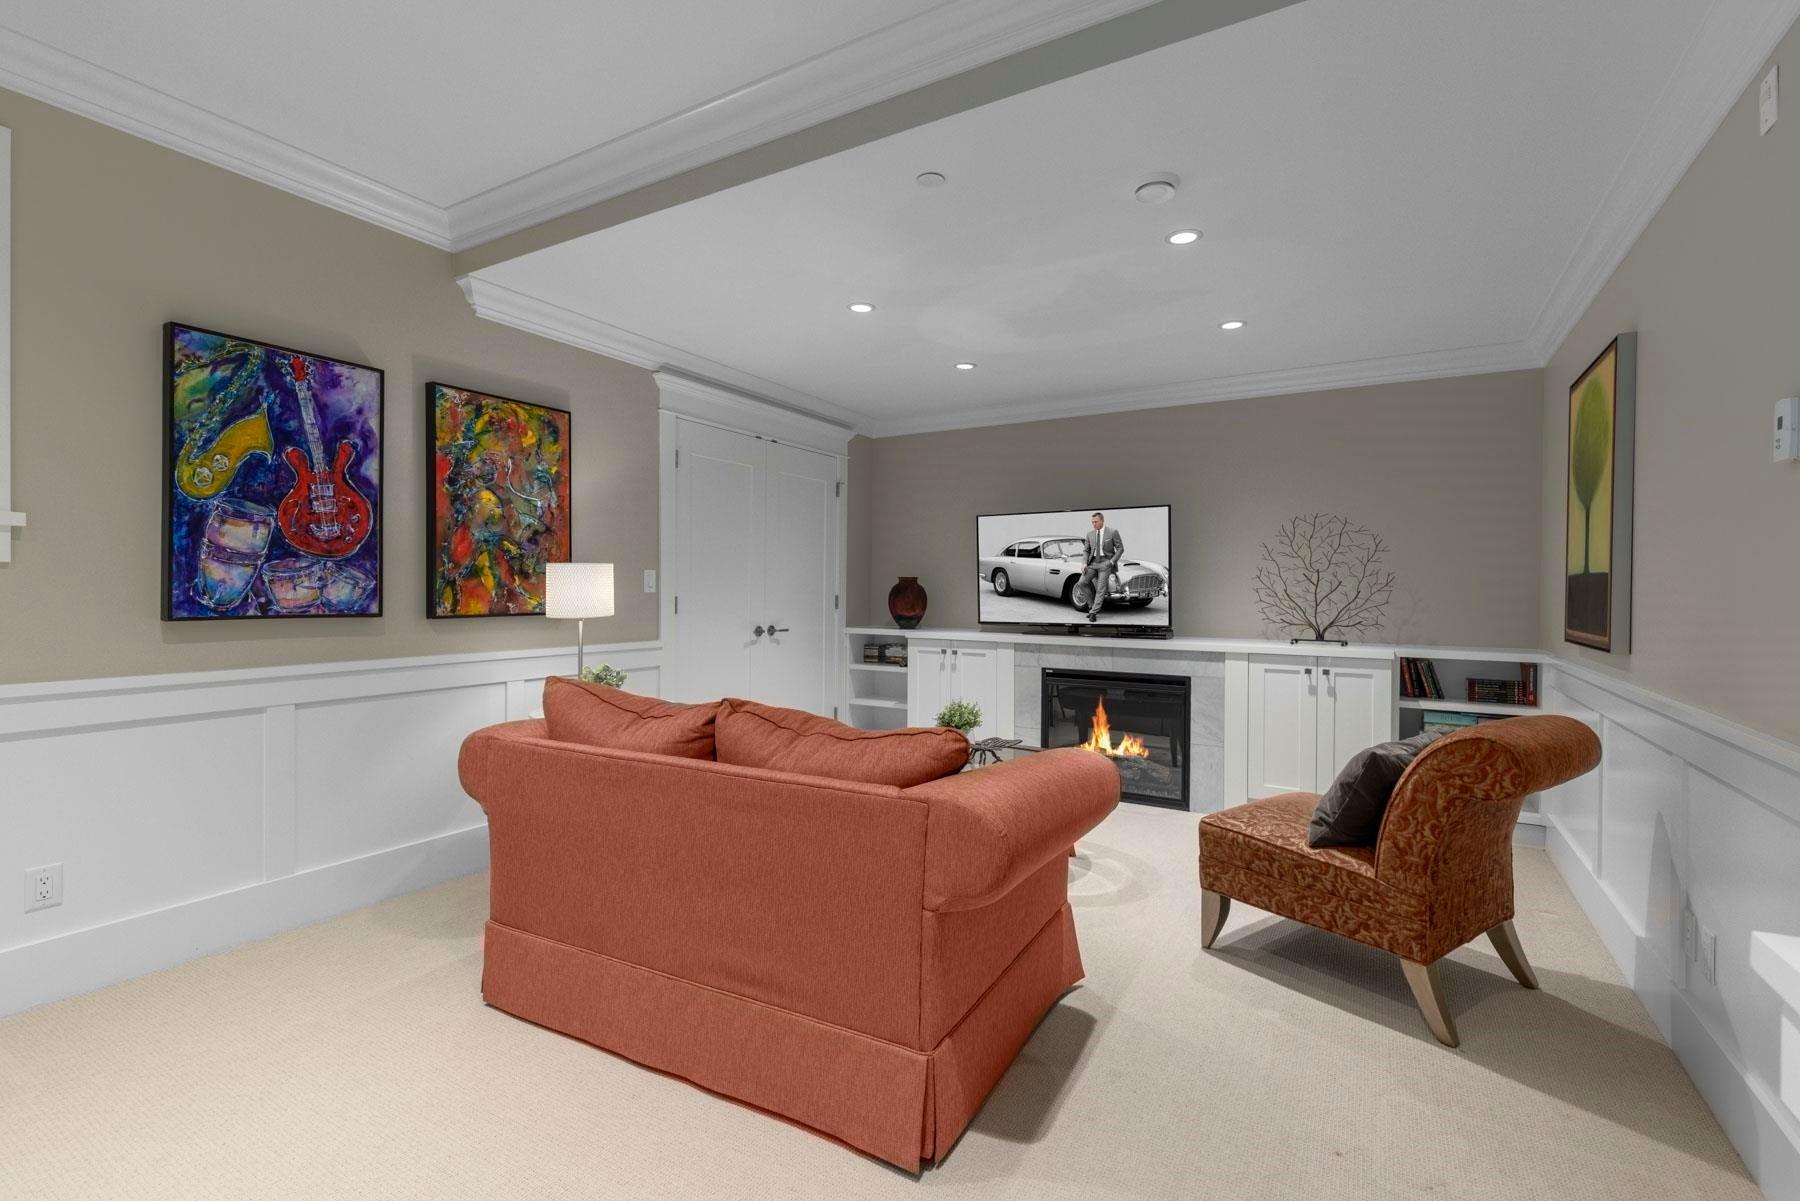 1421 GORDON AVENUE - Ambleside House/Single Family for sale, 3 Bedrooms (R2617756) - #17